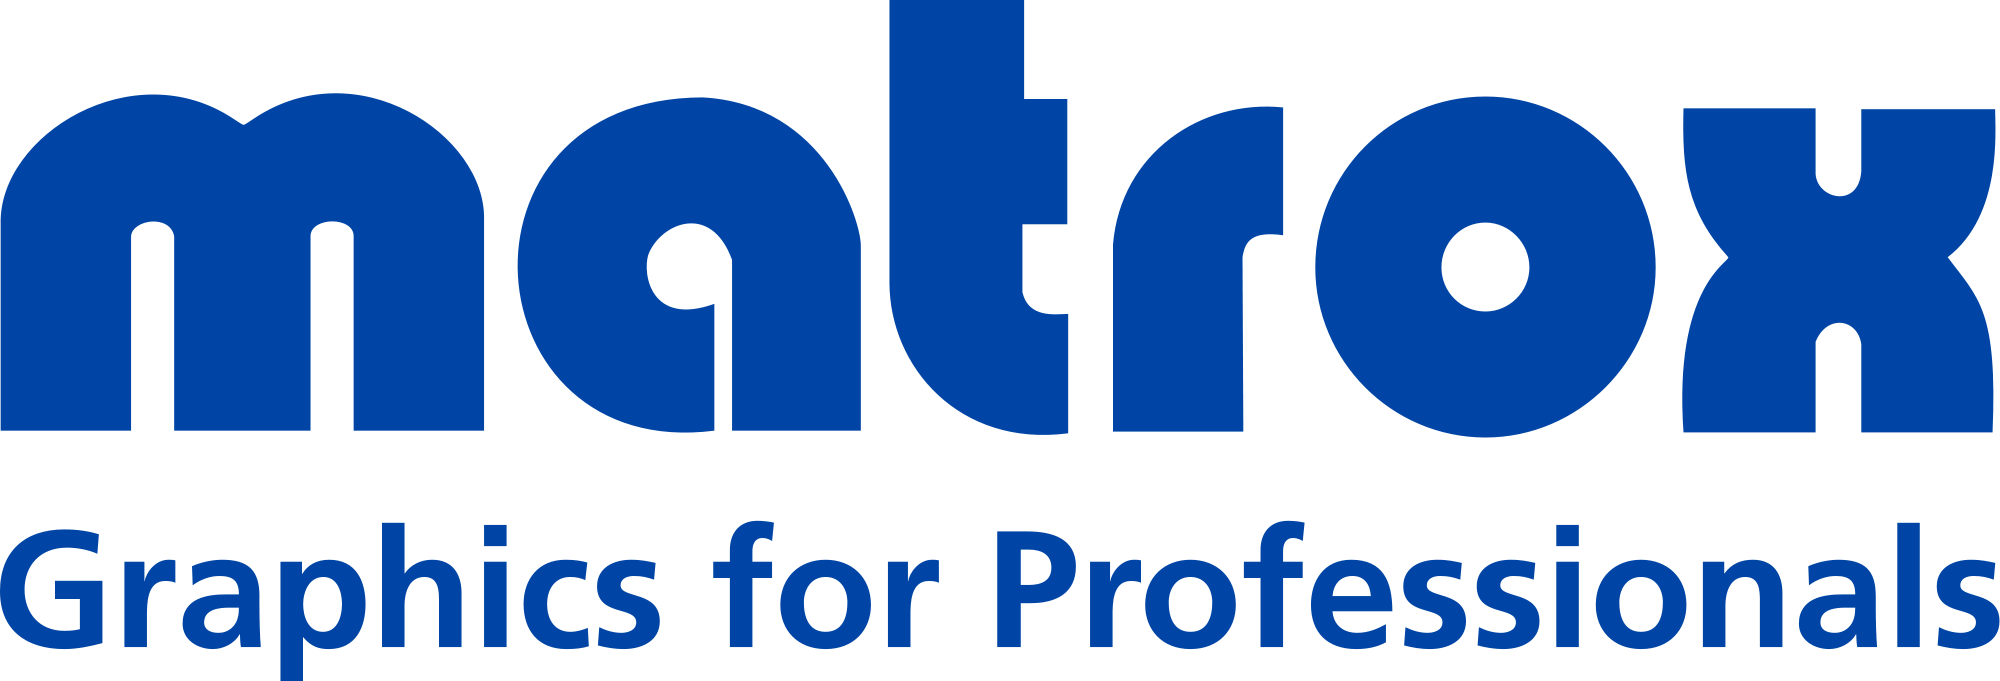 matrox-logo.png